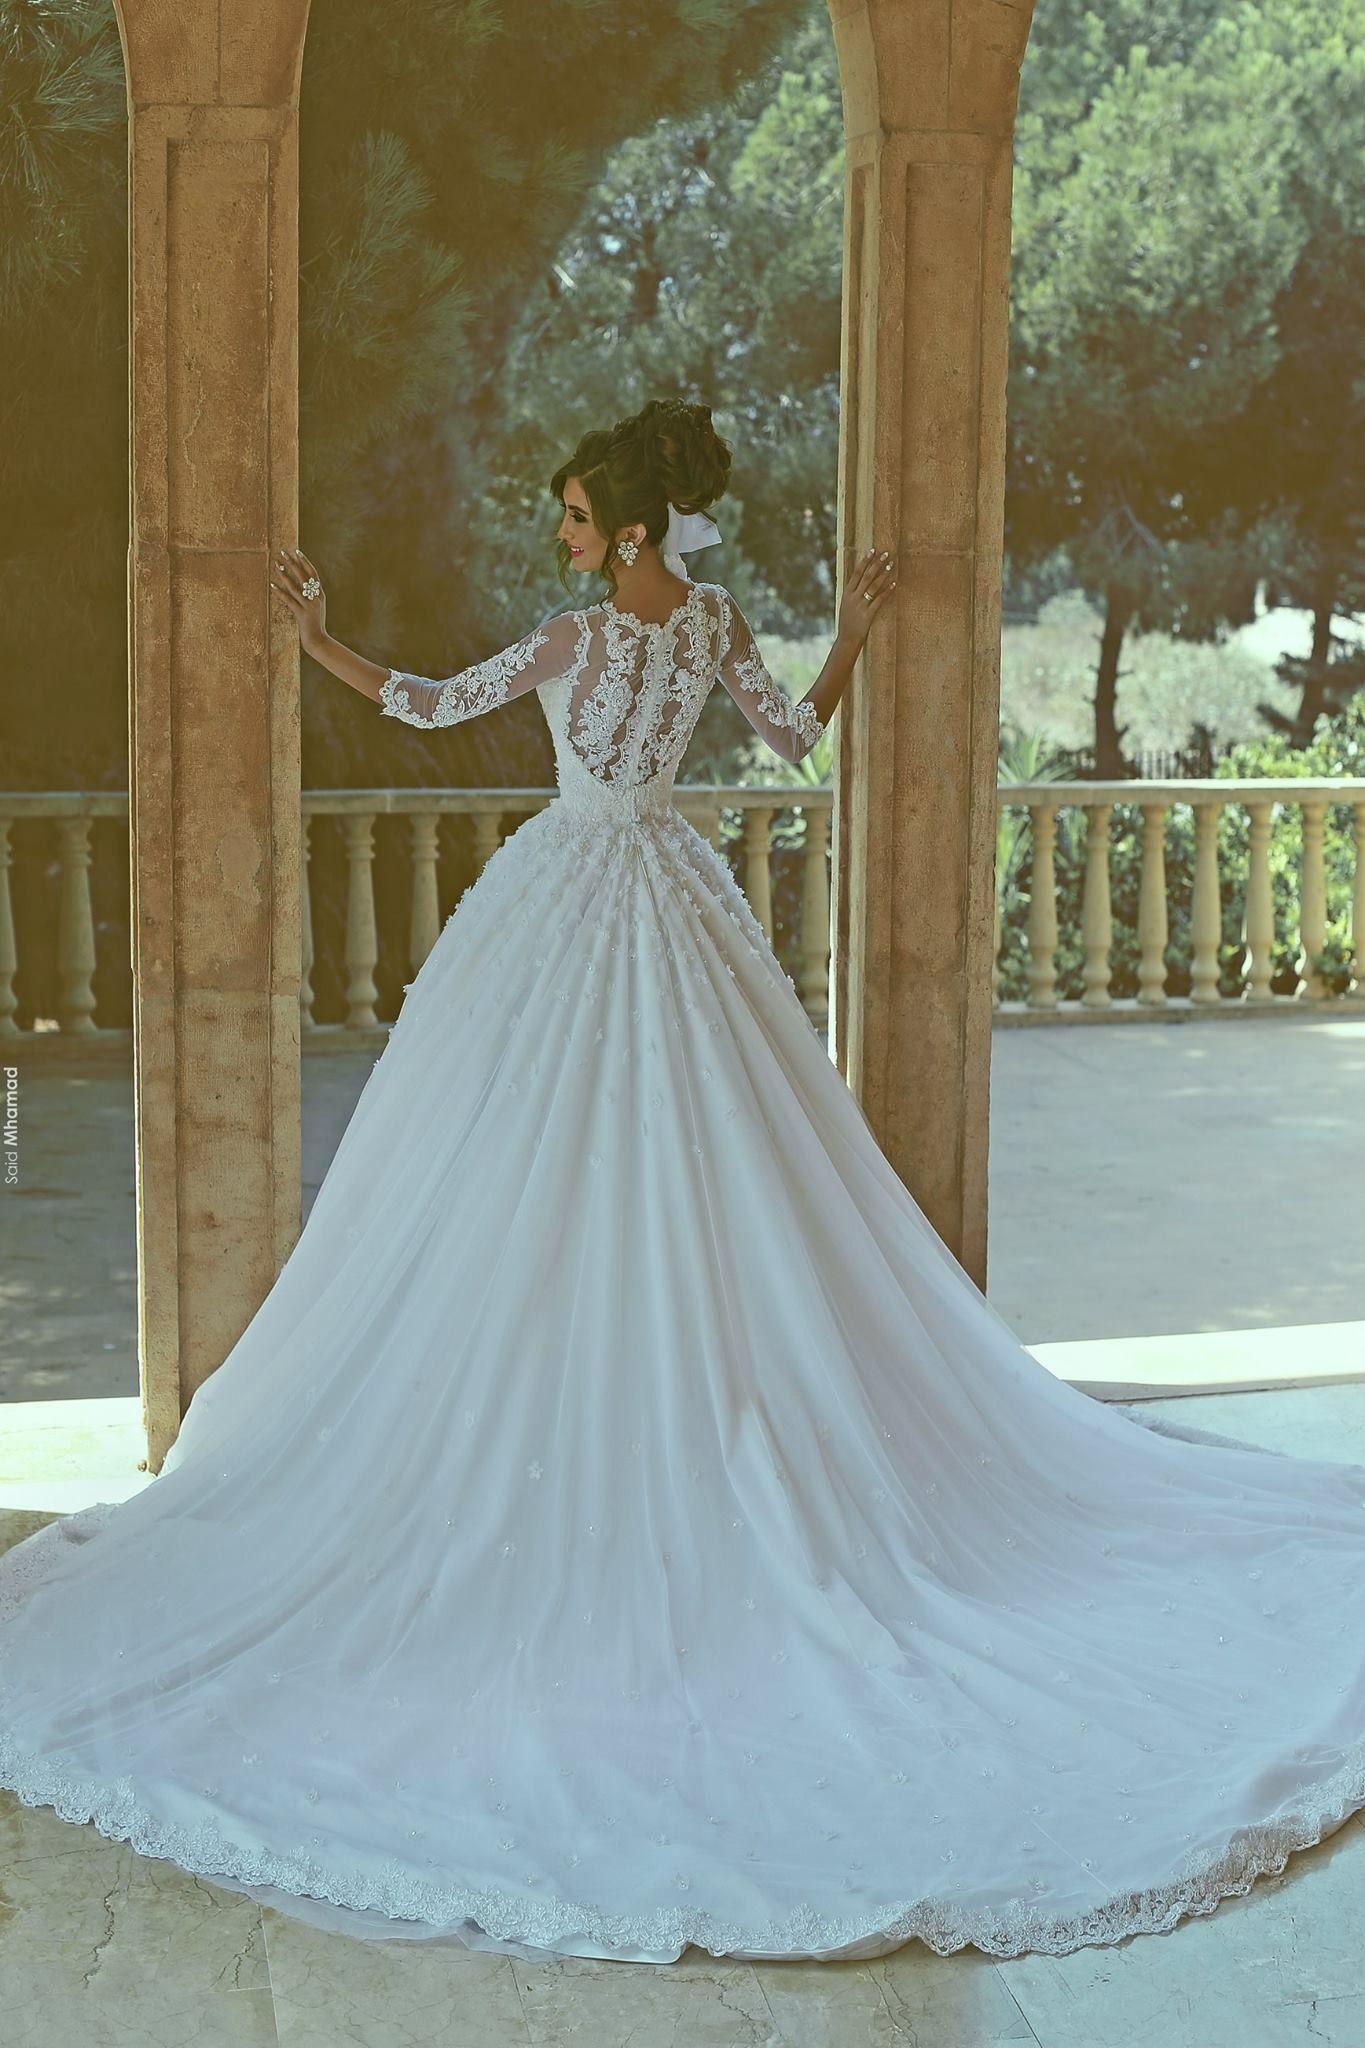 Pin de Dani Ramirez en Dream Weddings | Pinterest | Vestidos de ...